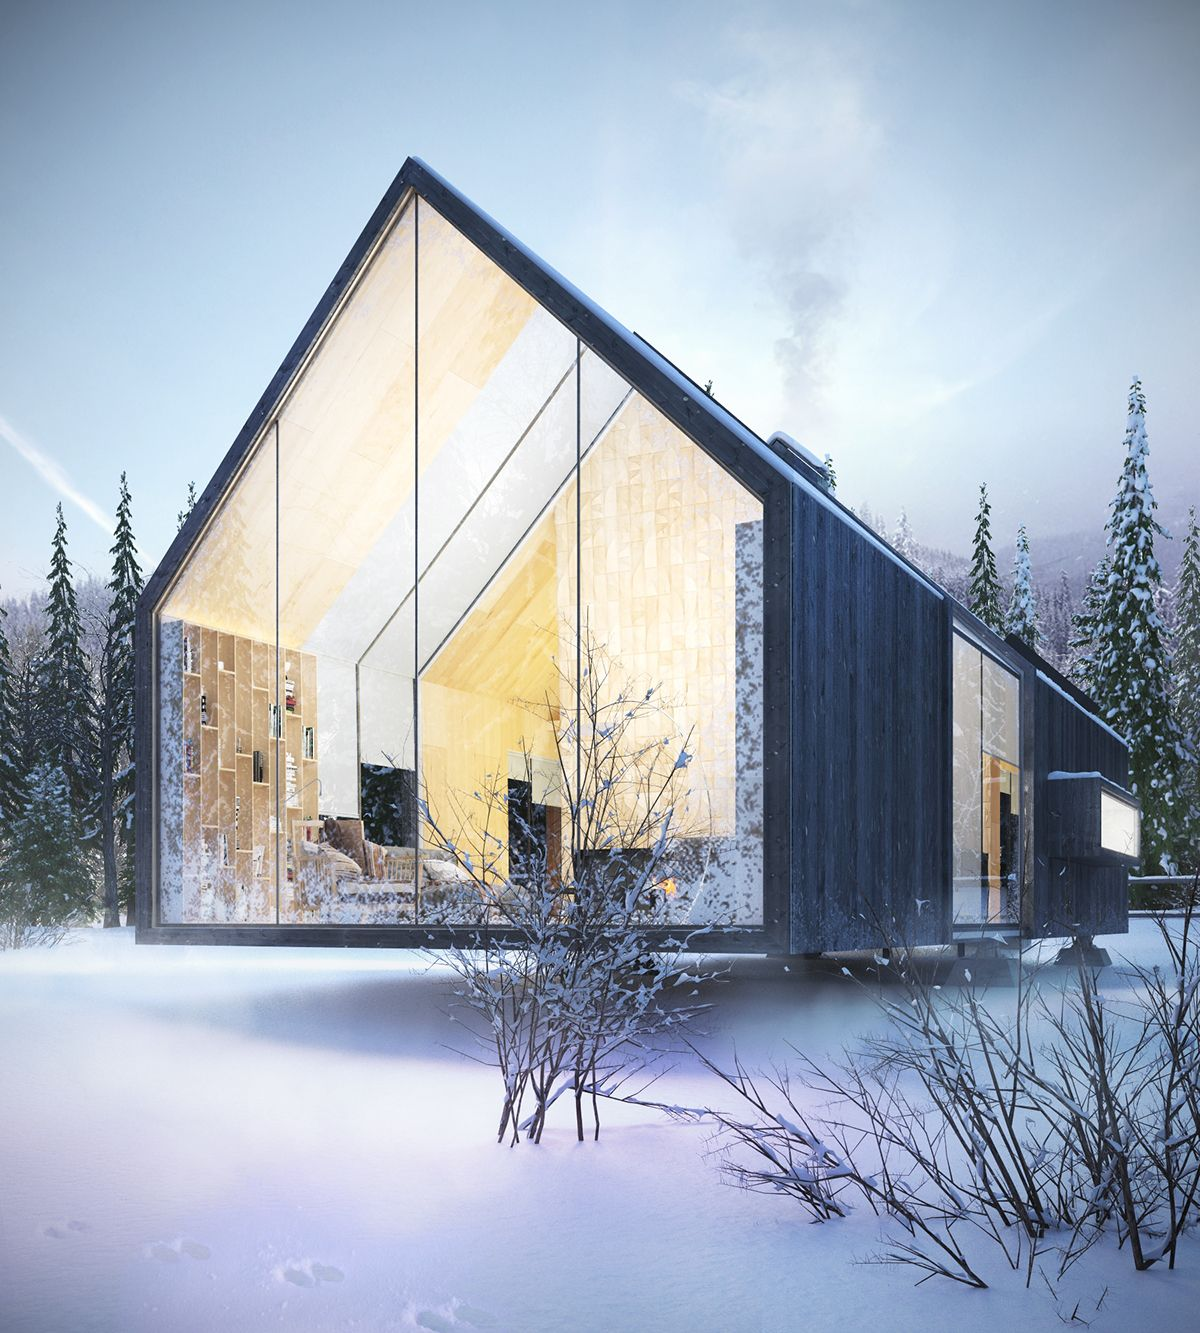 Timber Frame Self Build Homes From Scandia Hus: Retractable House / Dmitry Sheleg